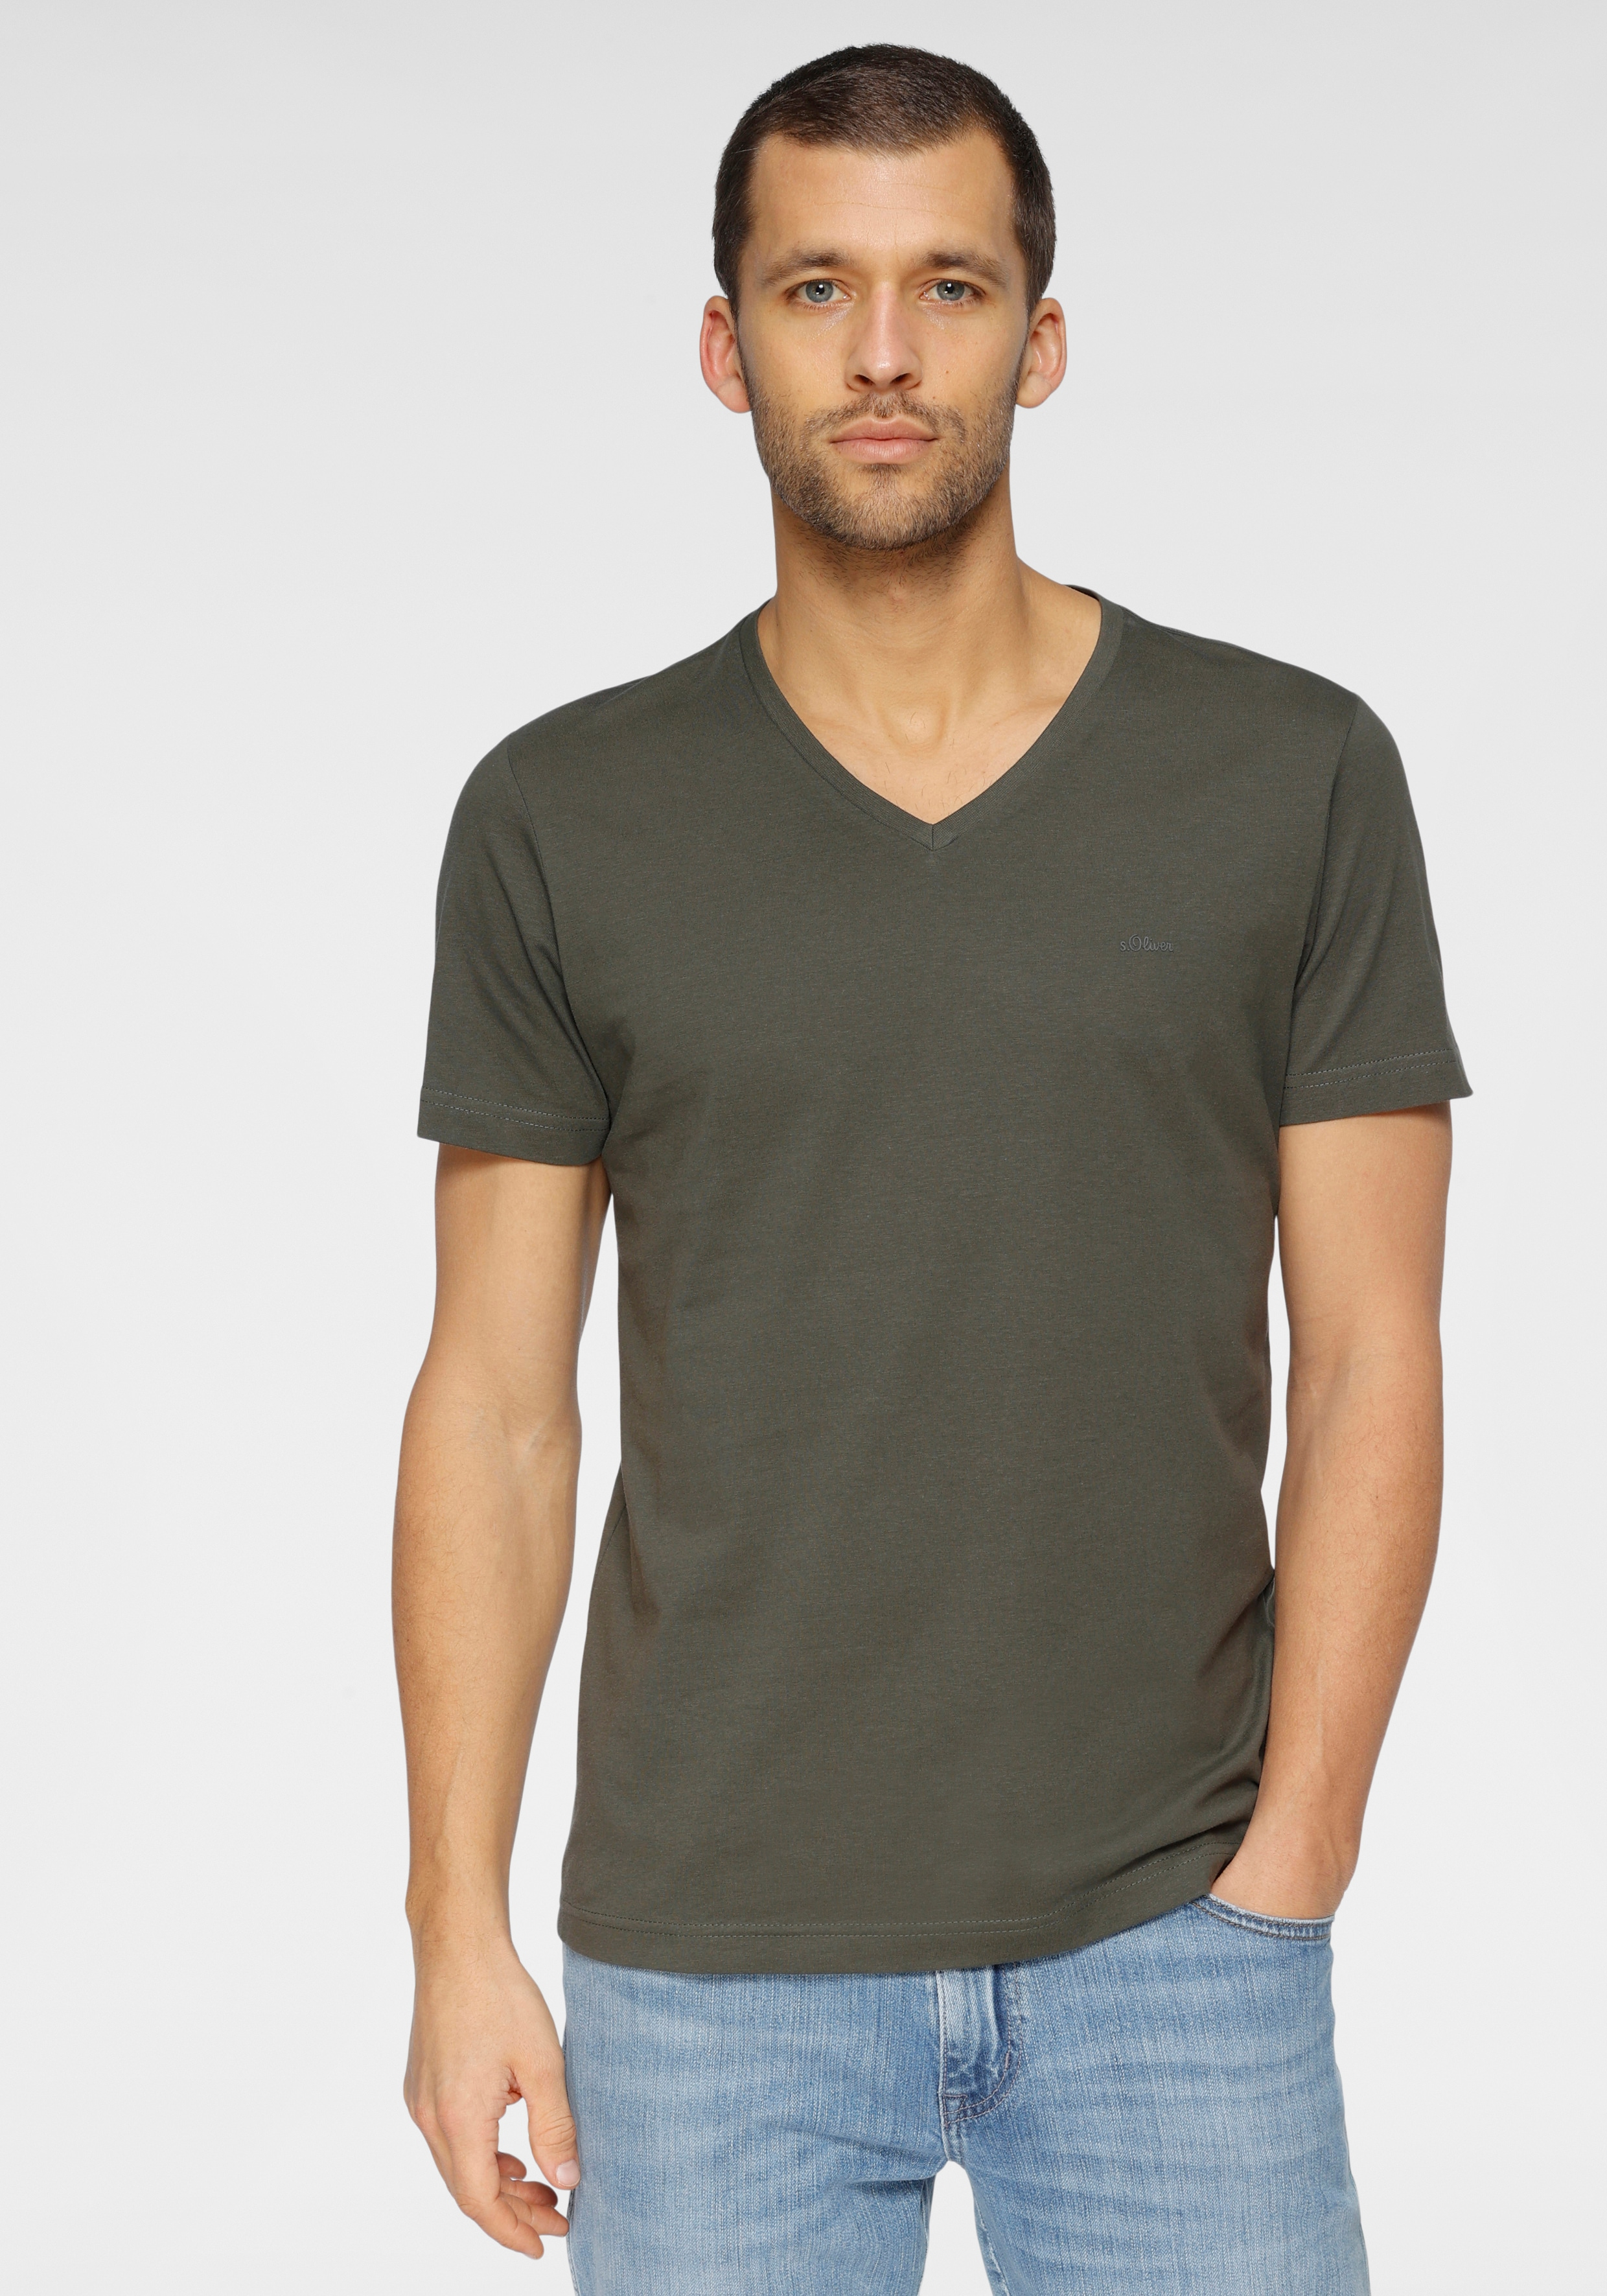 s.oliver -  T-Shirt, mit V-Ausschnitt